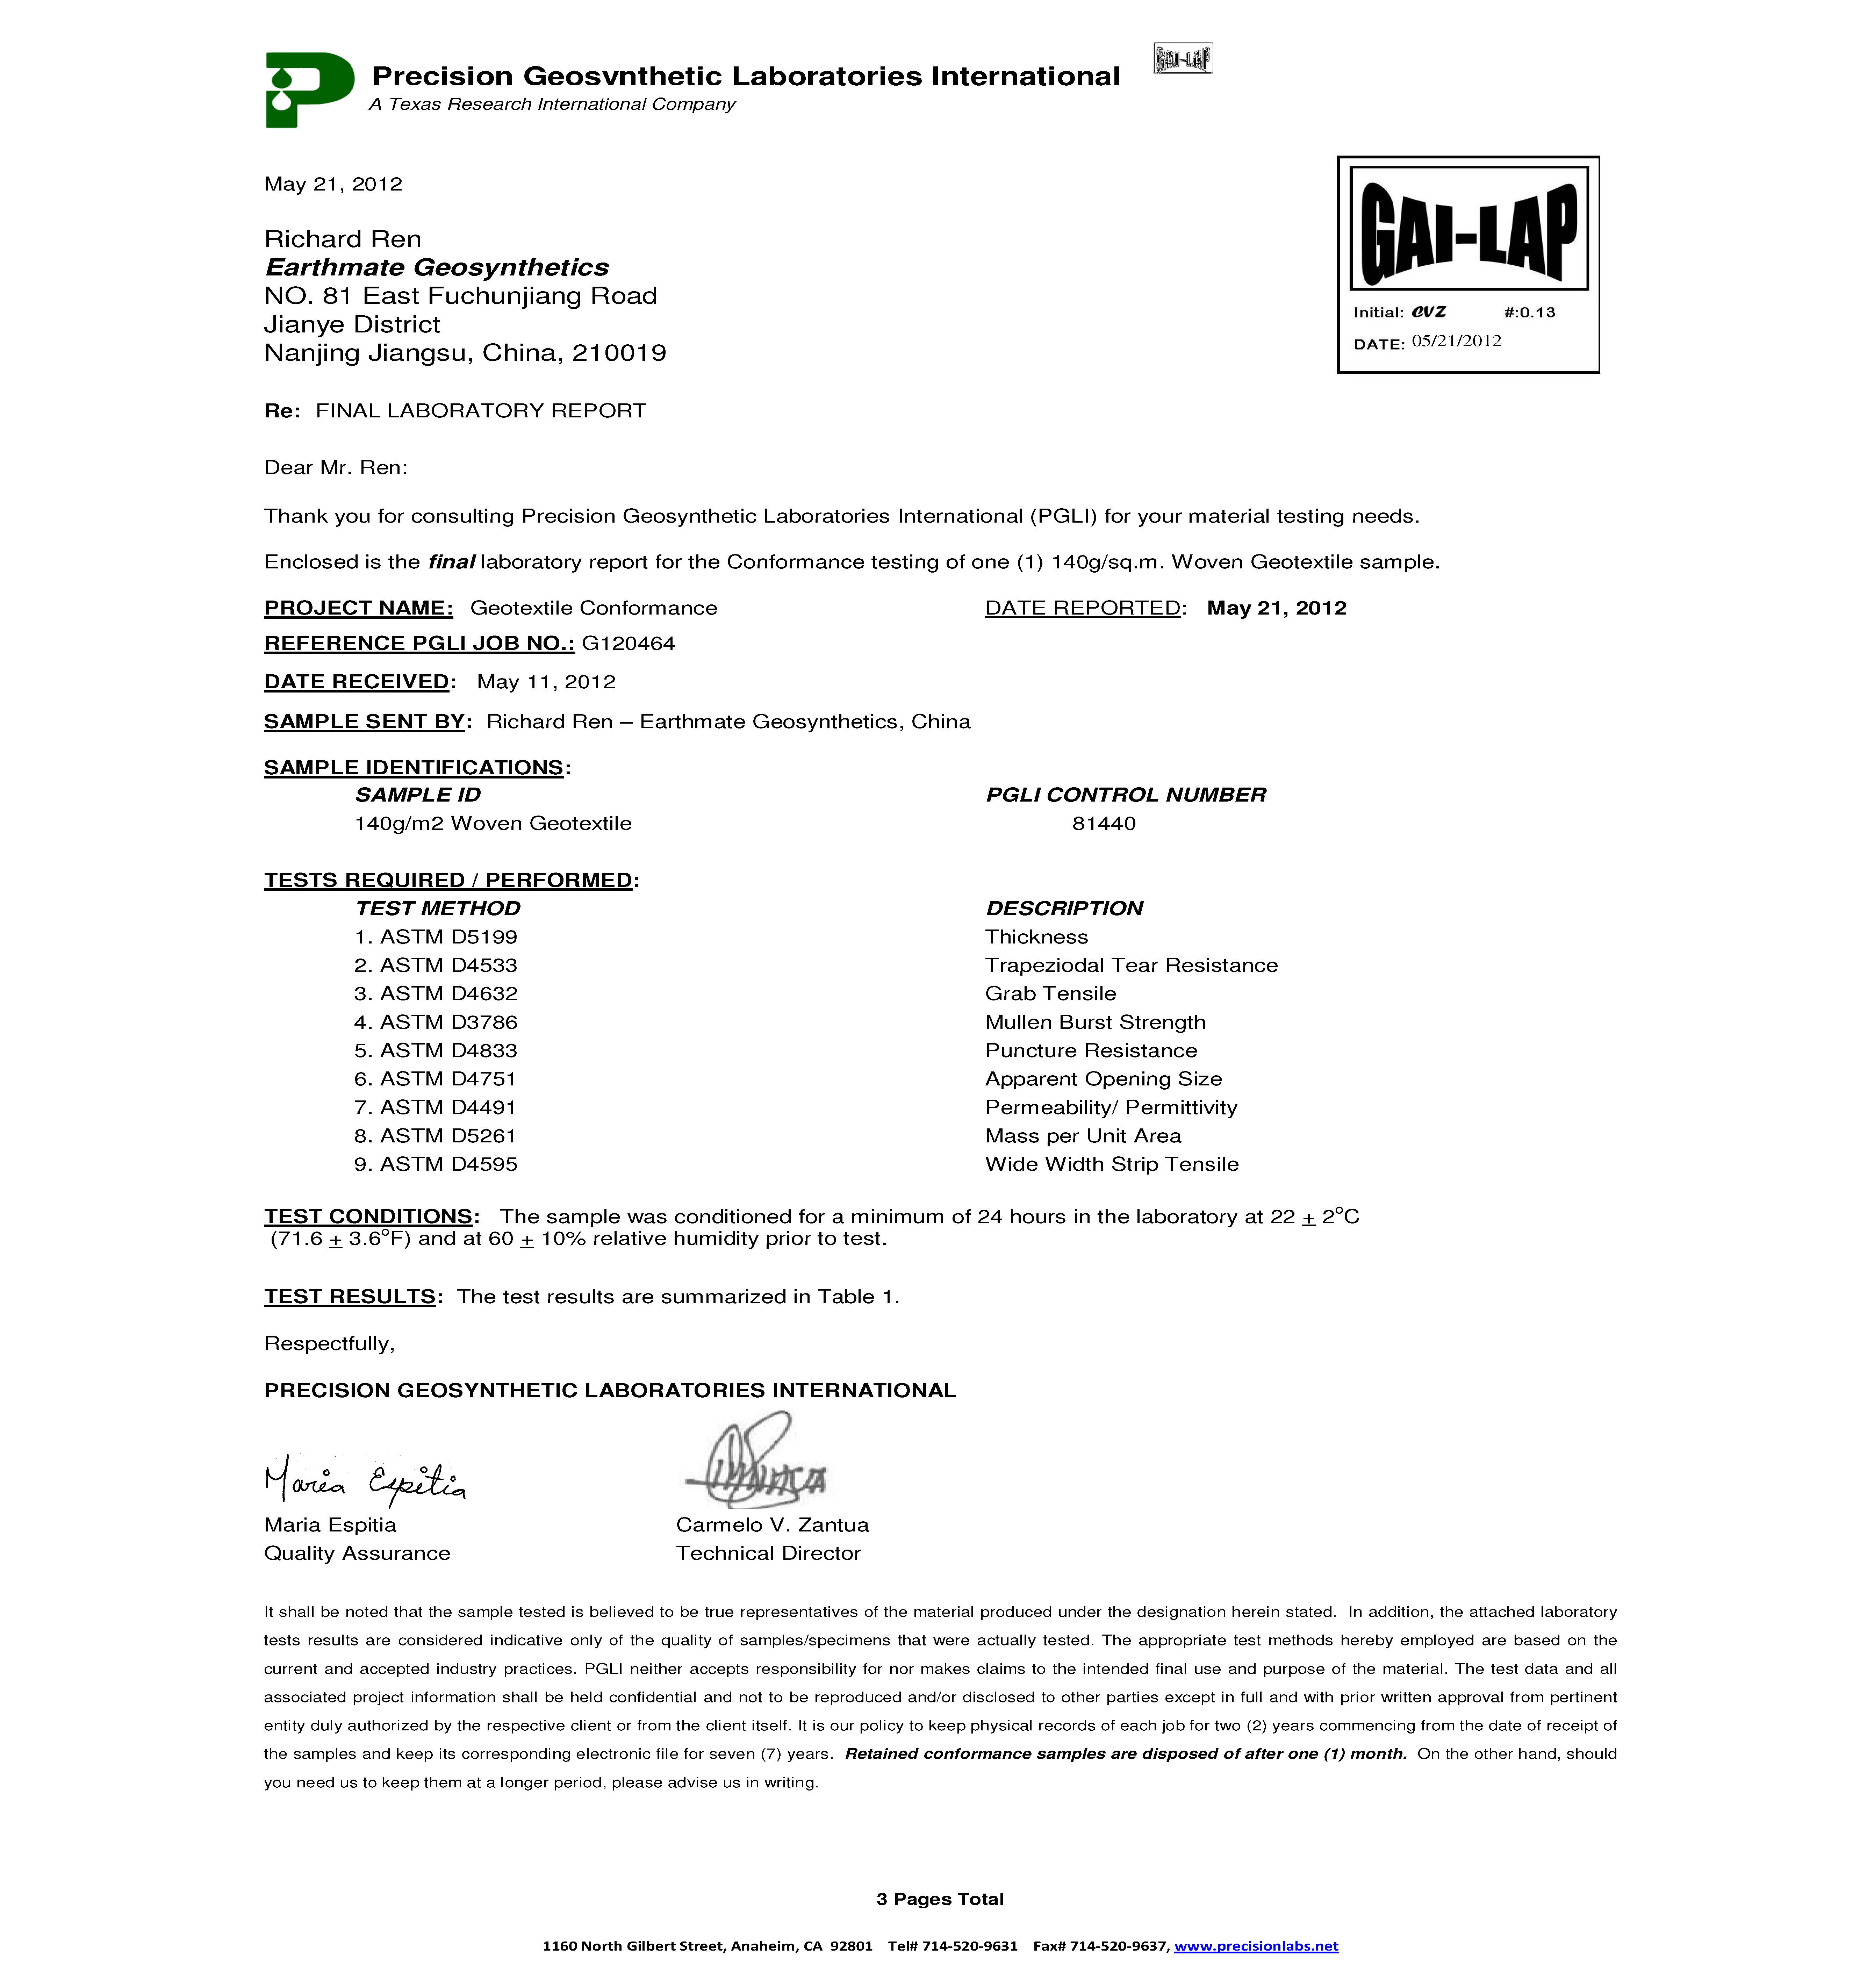 BASALFAB PWG140 Testing Report | PGL,U.S.A